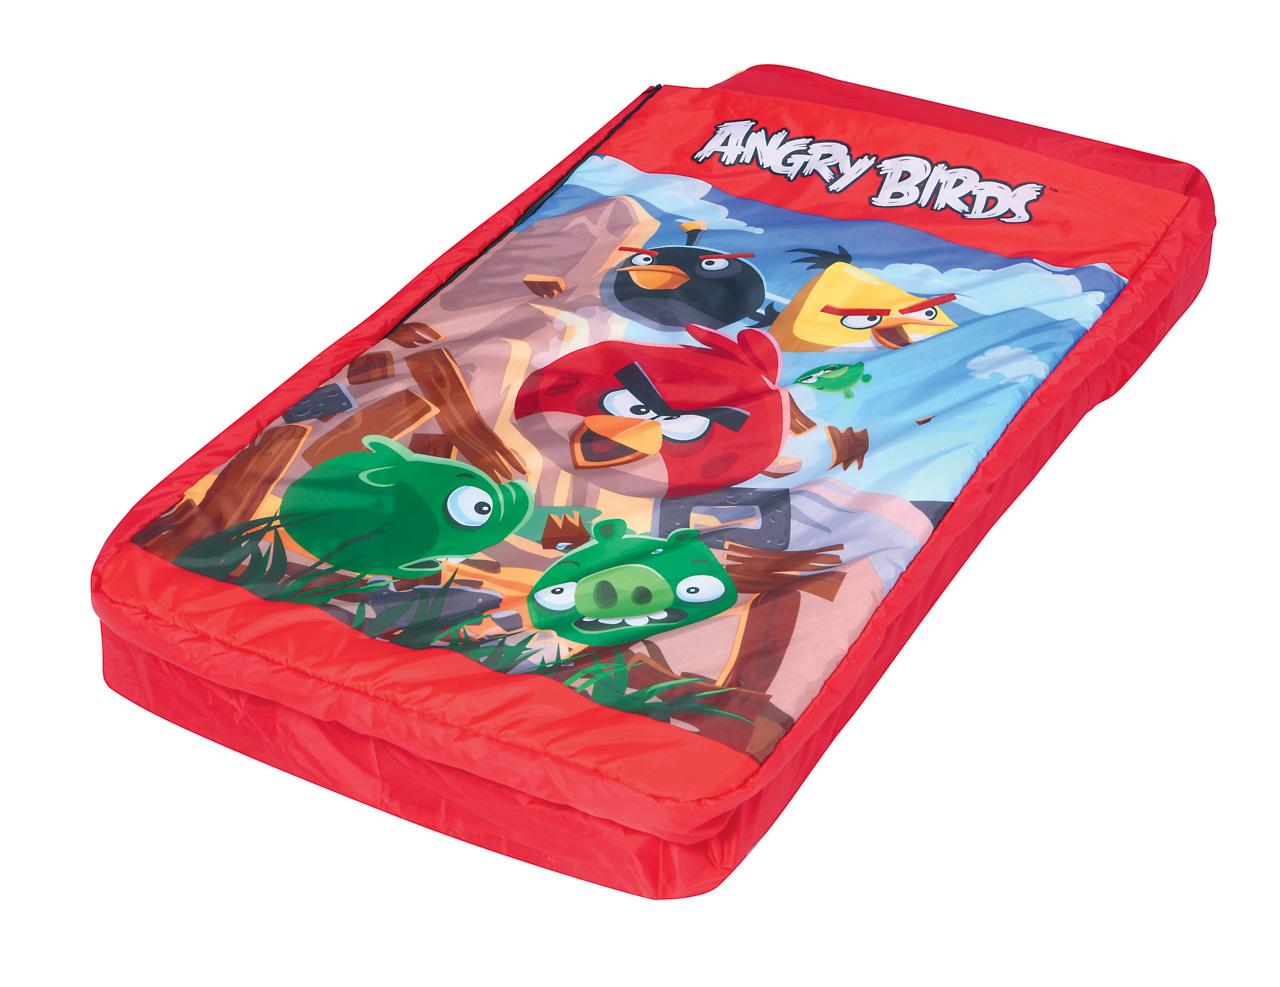 2 in 1 Nafukovací lehátko se spacákem Angry Birds - 132 x 76 x 20cm